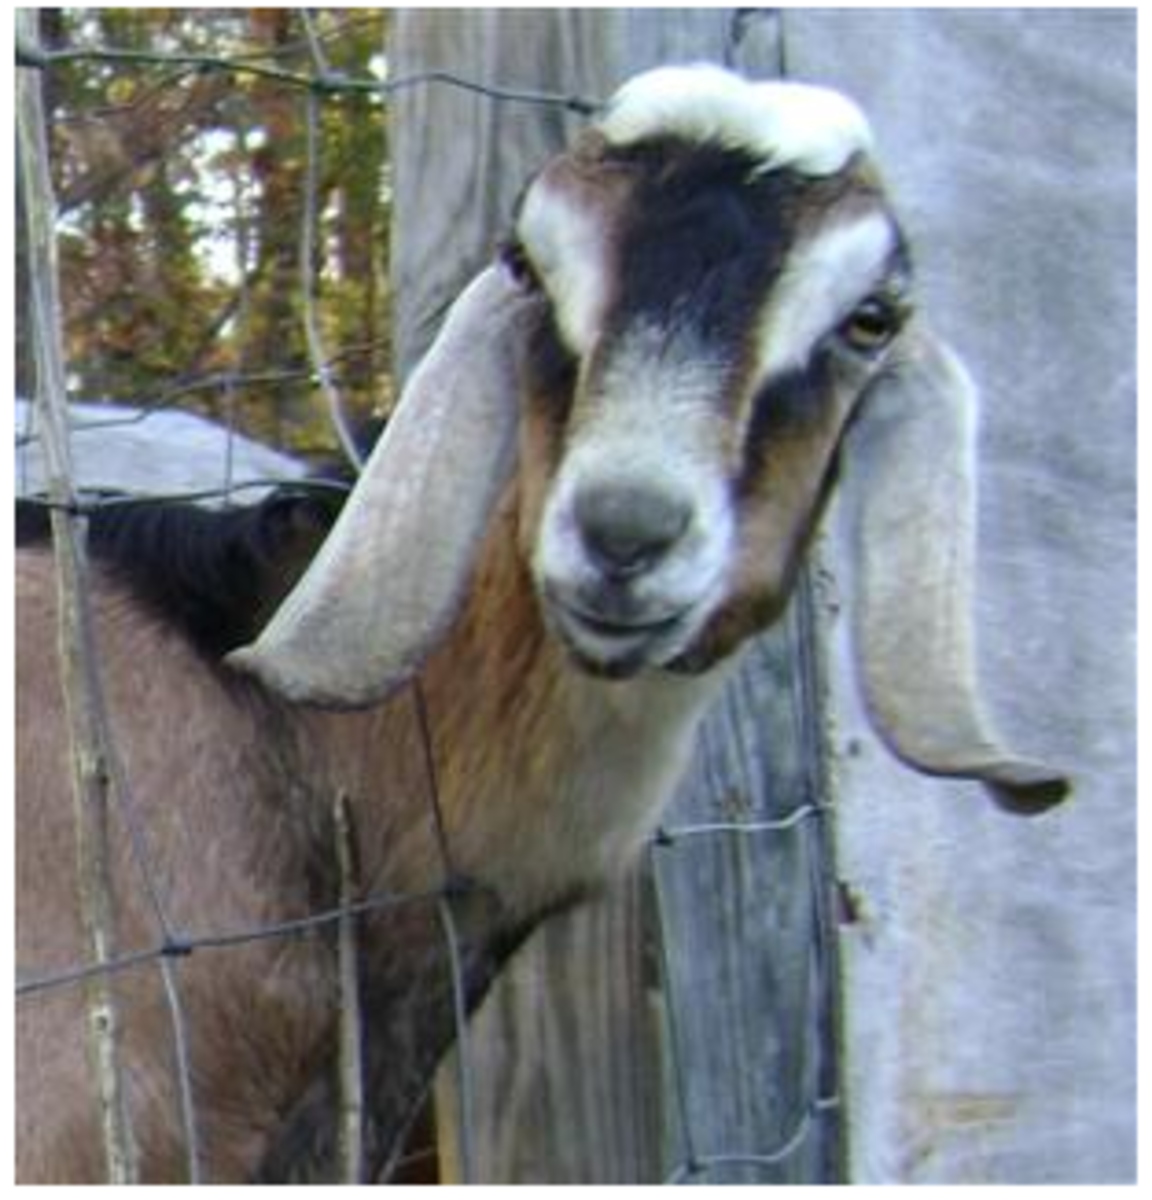 goat milk alternative